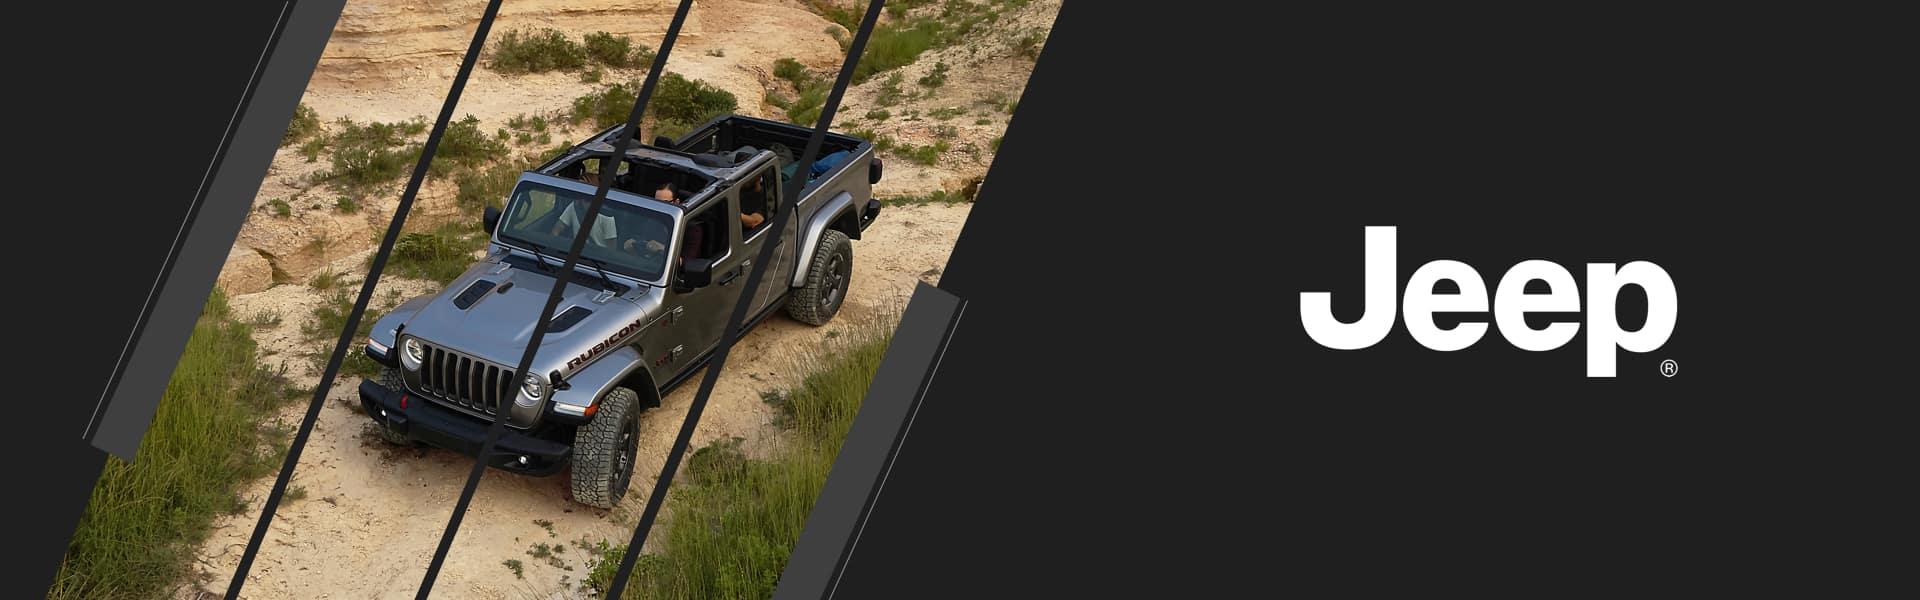 Desktop Jeep